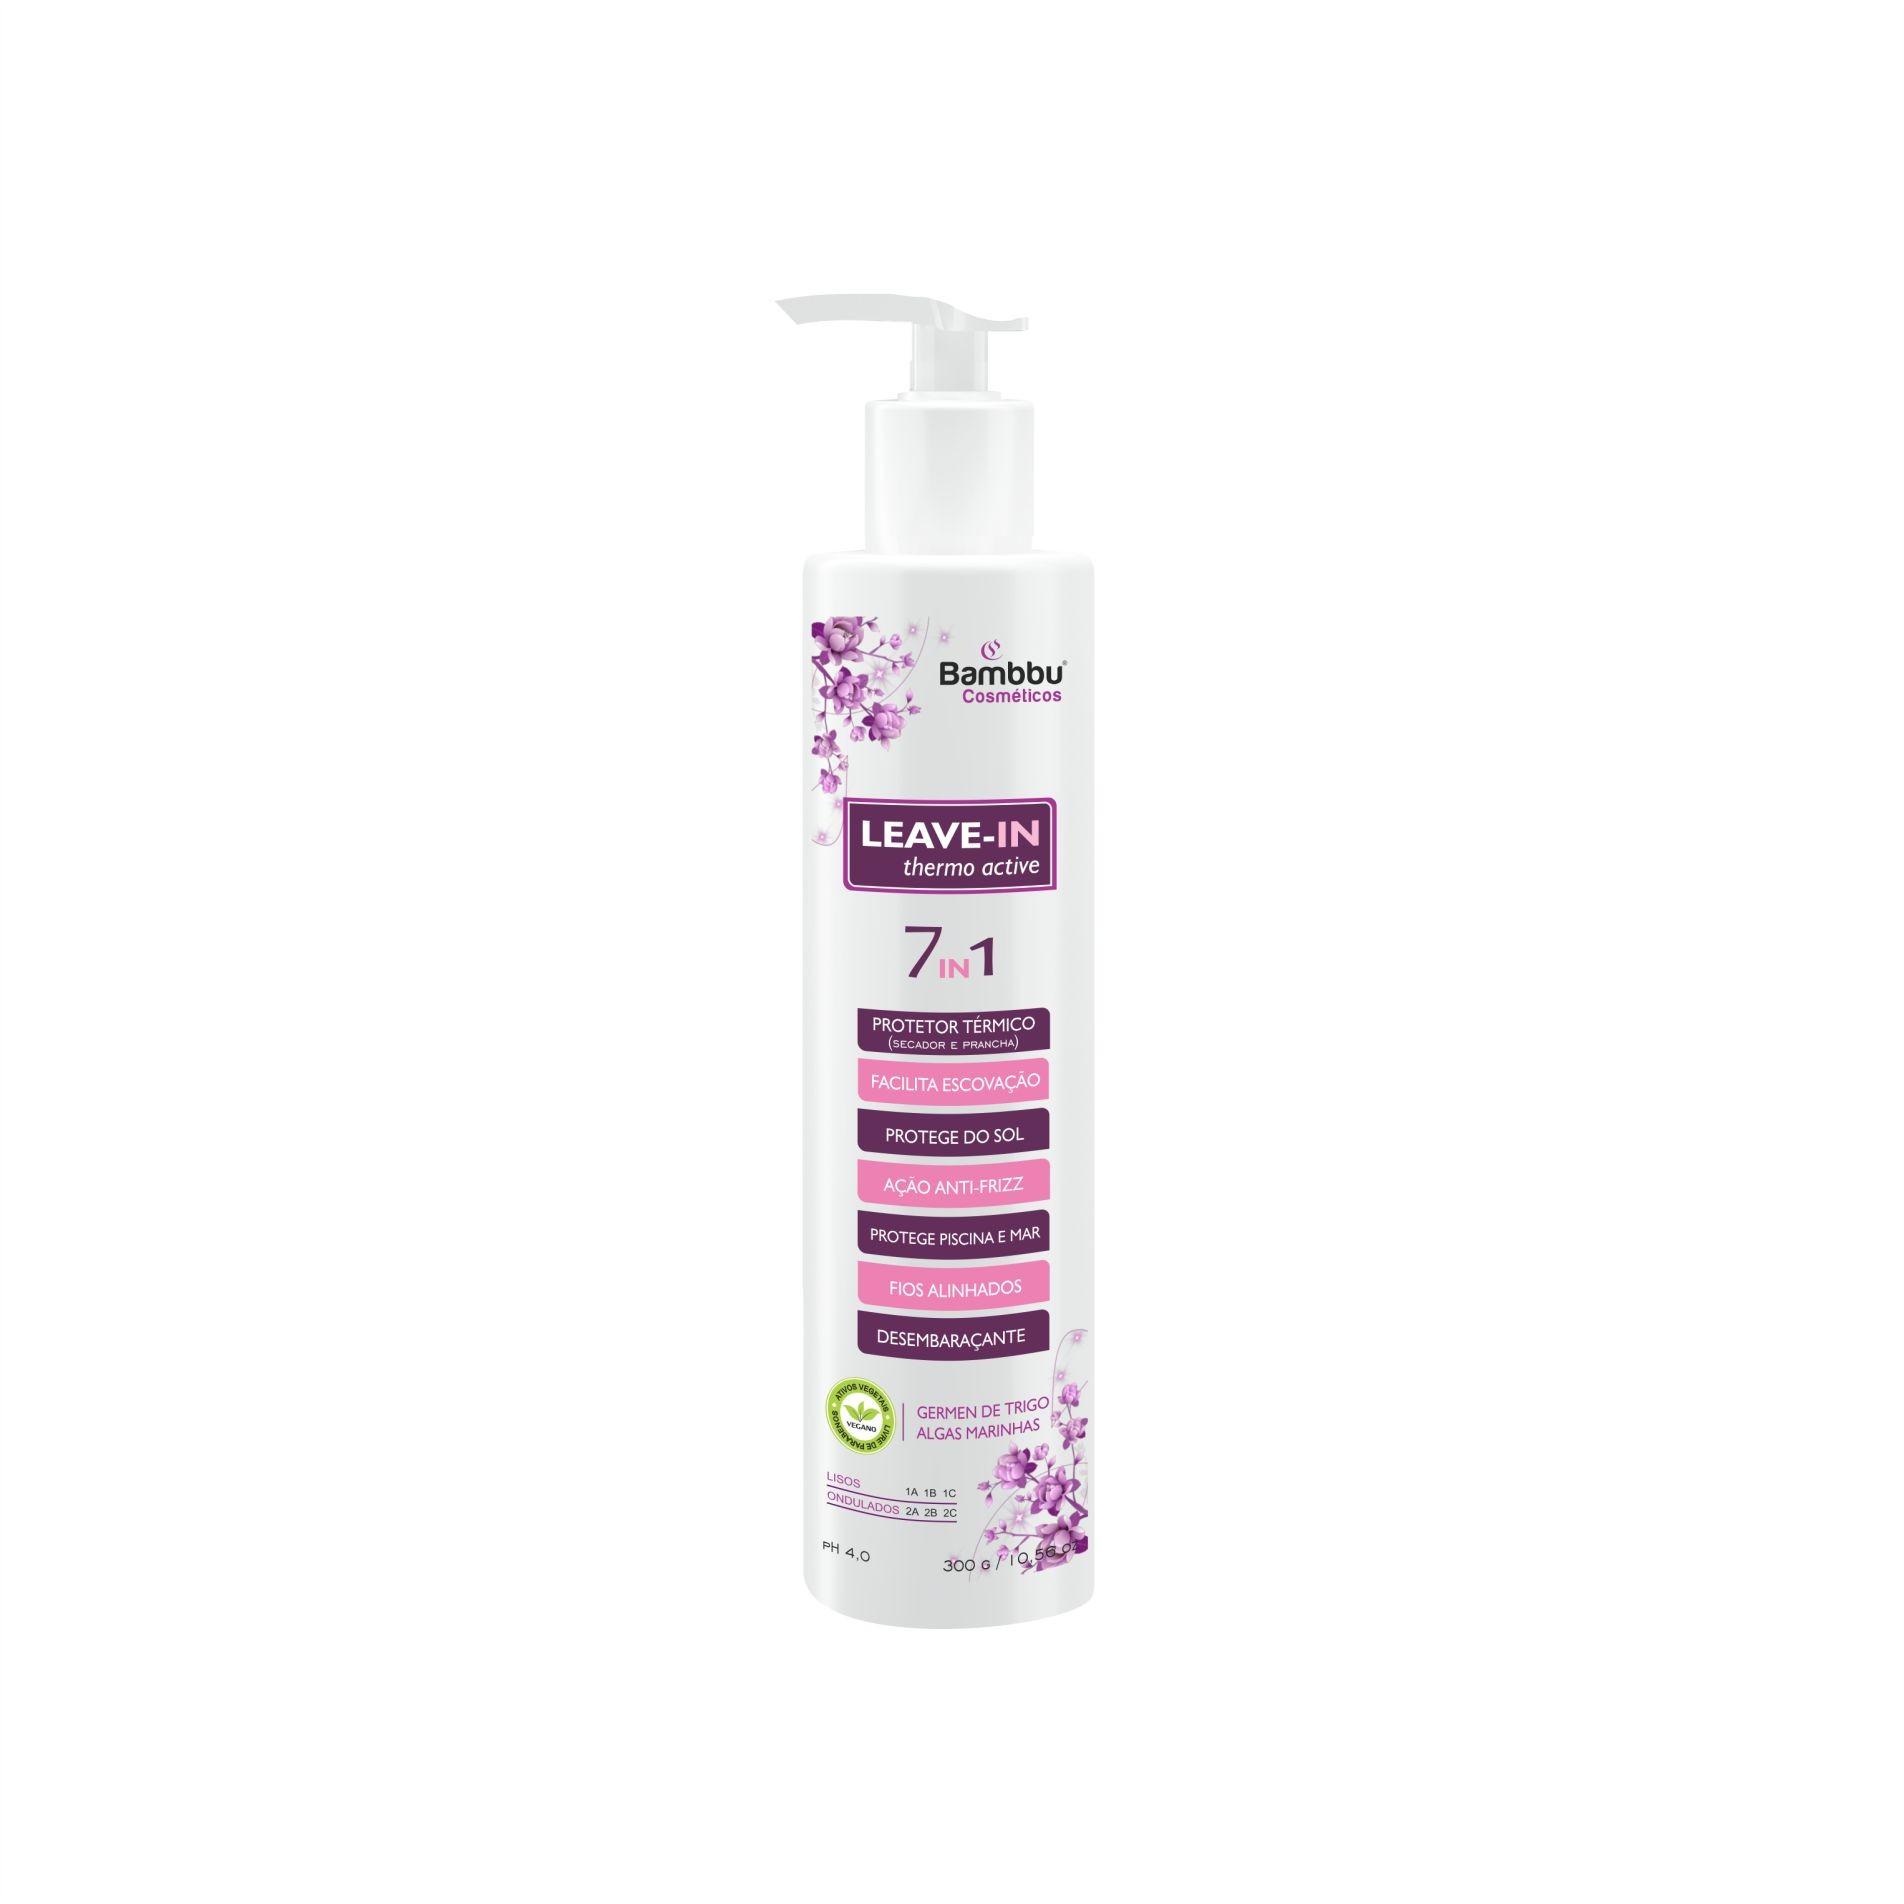 Leave-in - Thermo Active 7 in 1 (Protetor Térmico) - Todos os tipos de cabelos lisos e com cor